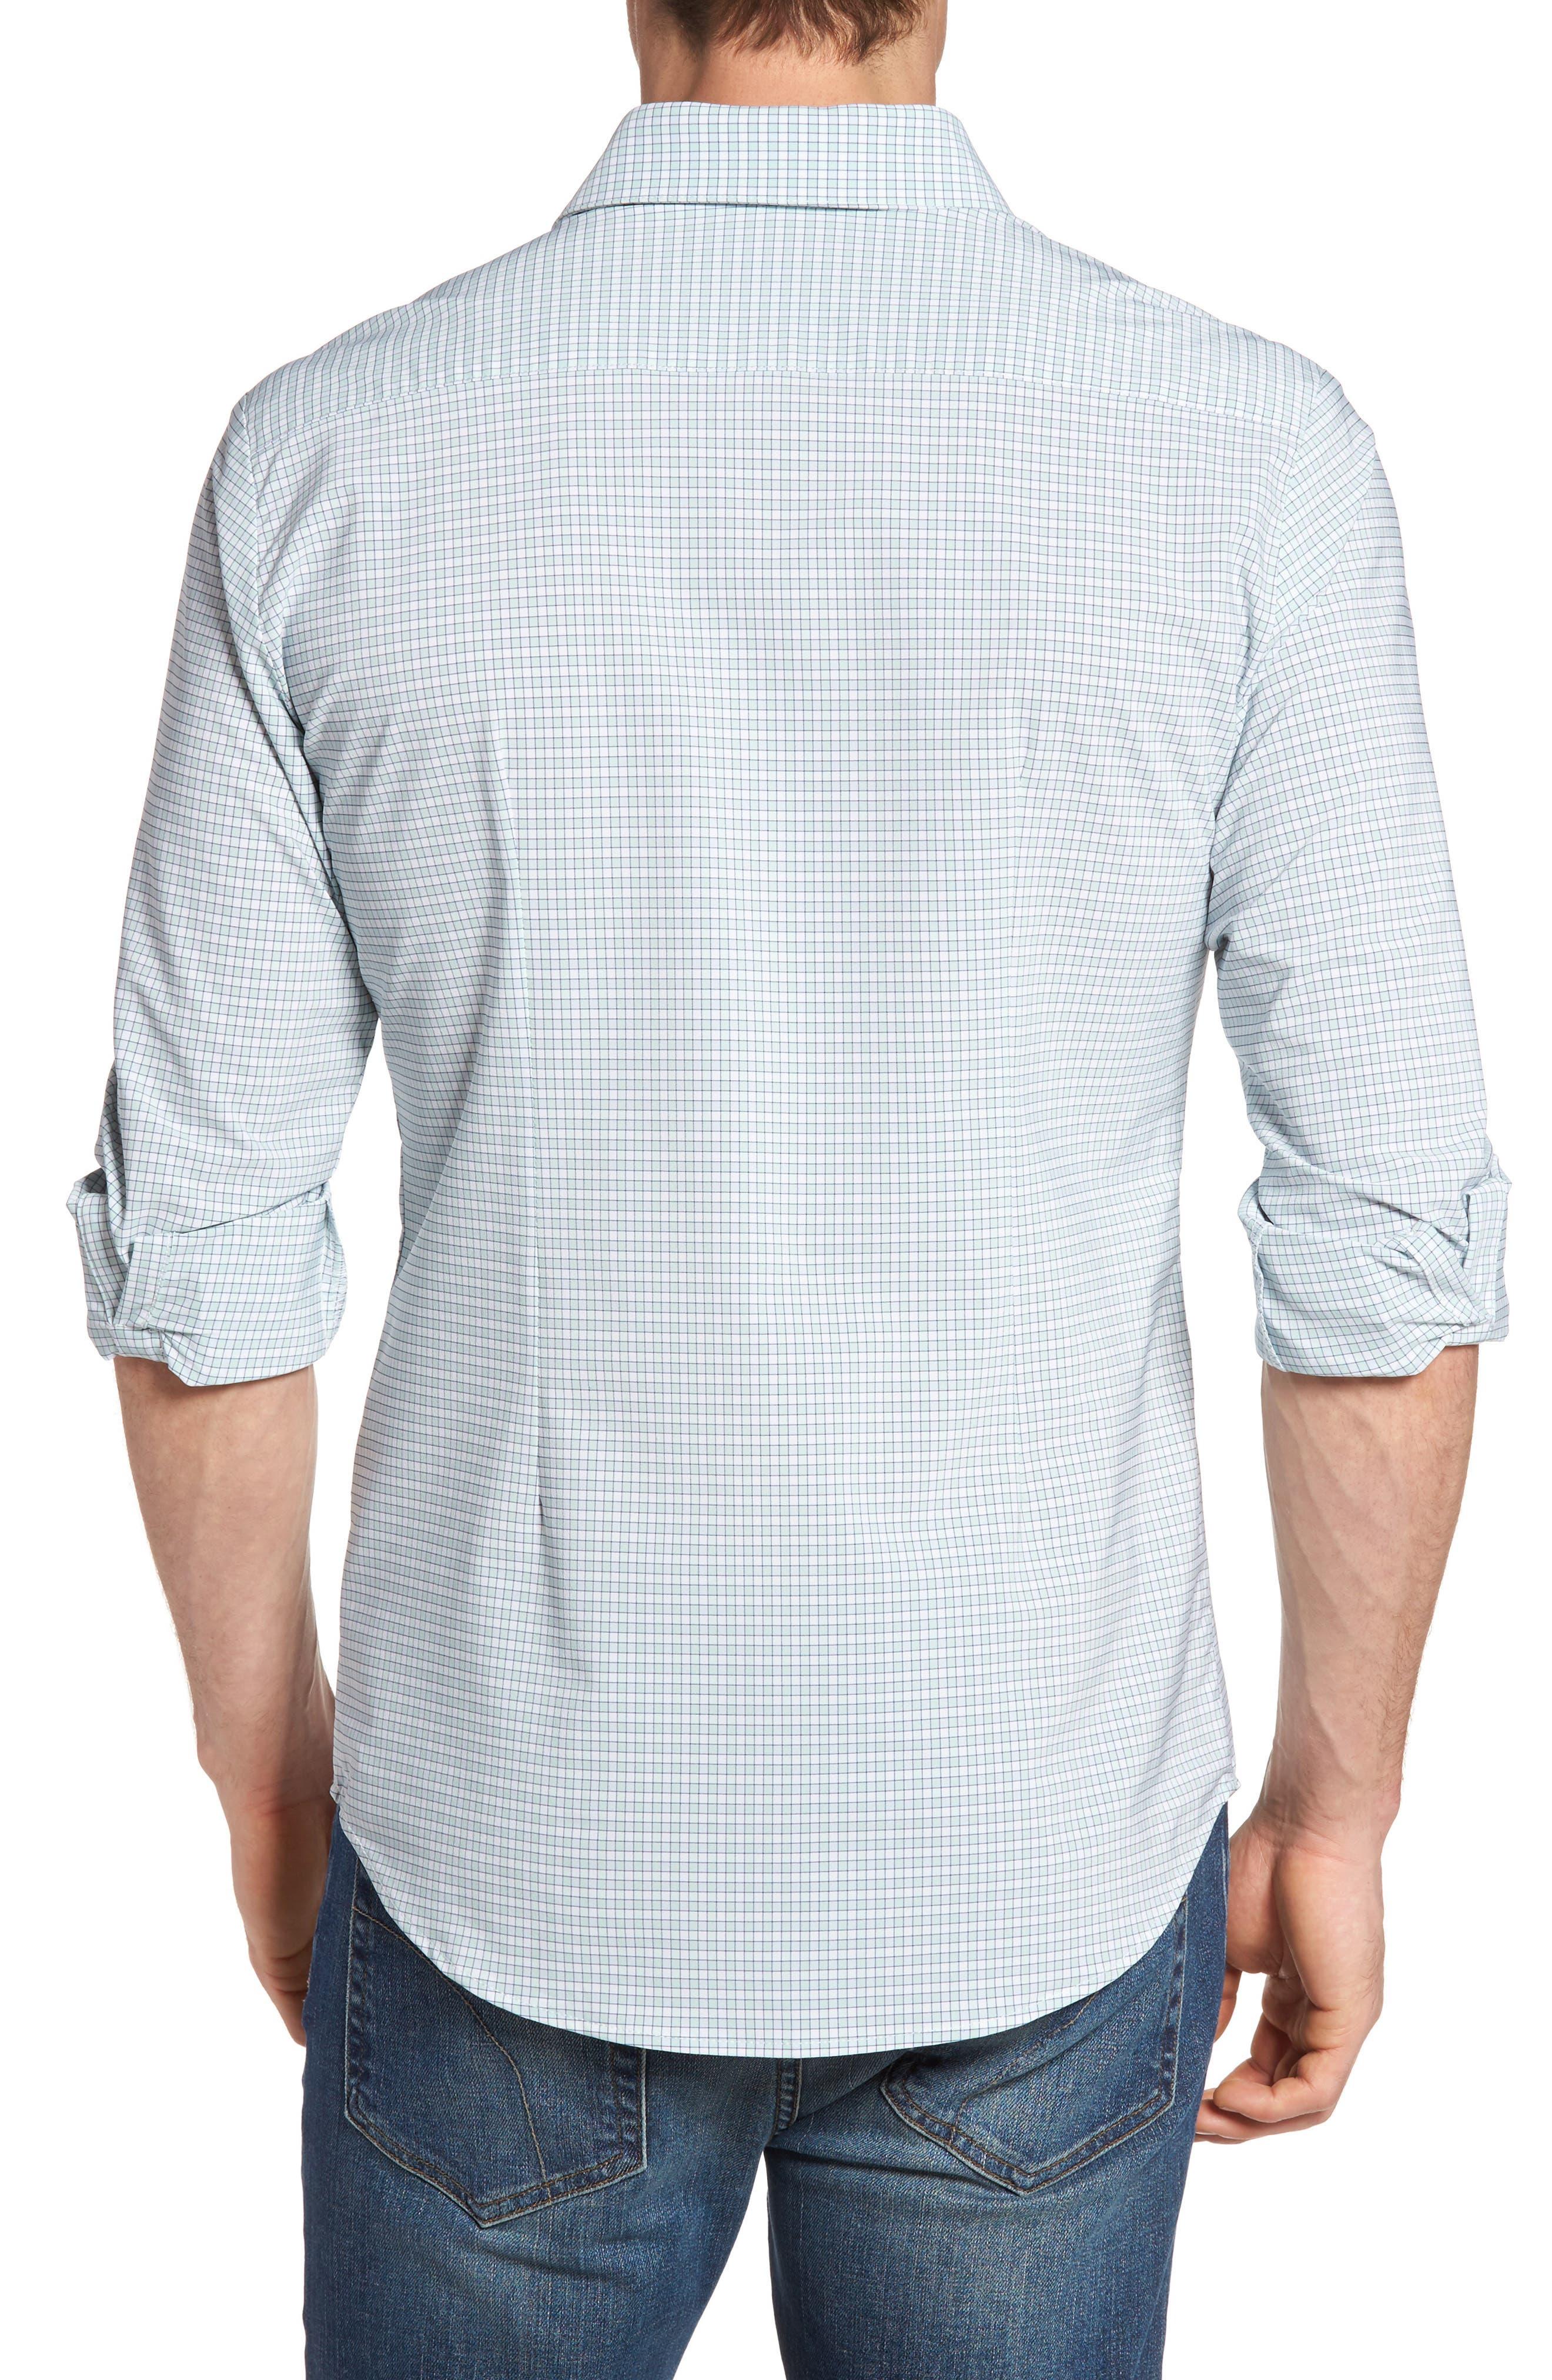 Thames Illusion Gingham Performance Sport Shirt,                             Alternate thumbnail 2, color,                             300